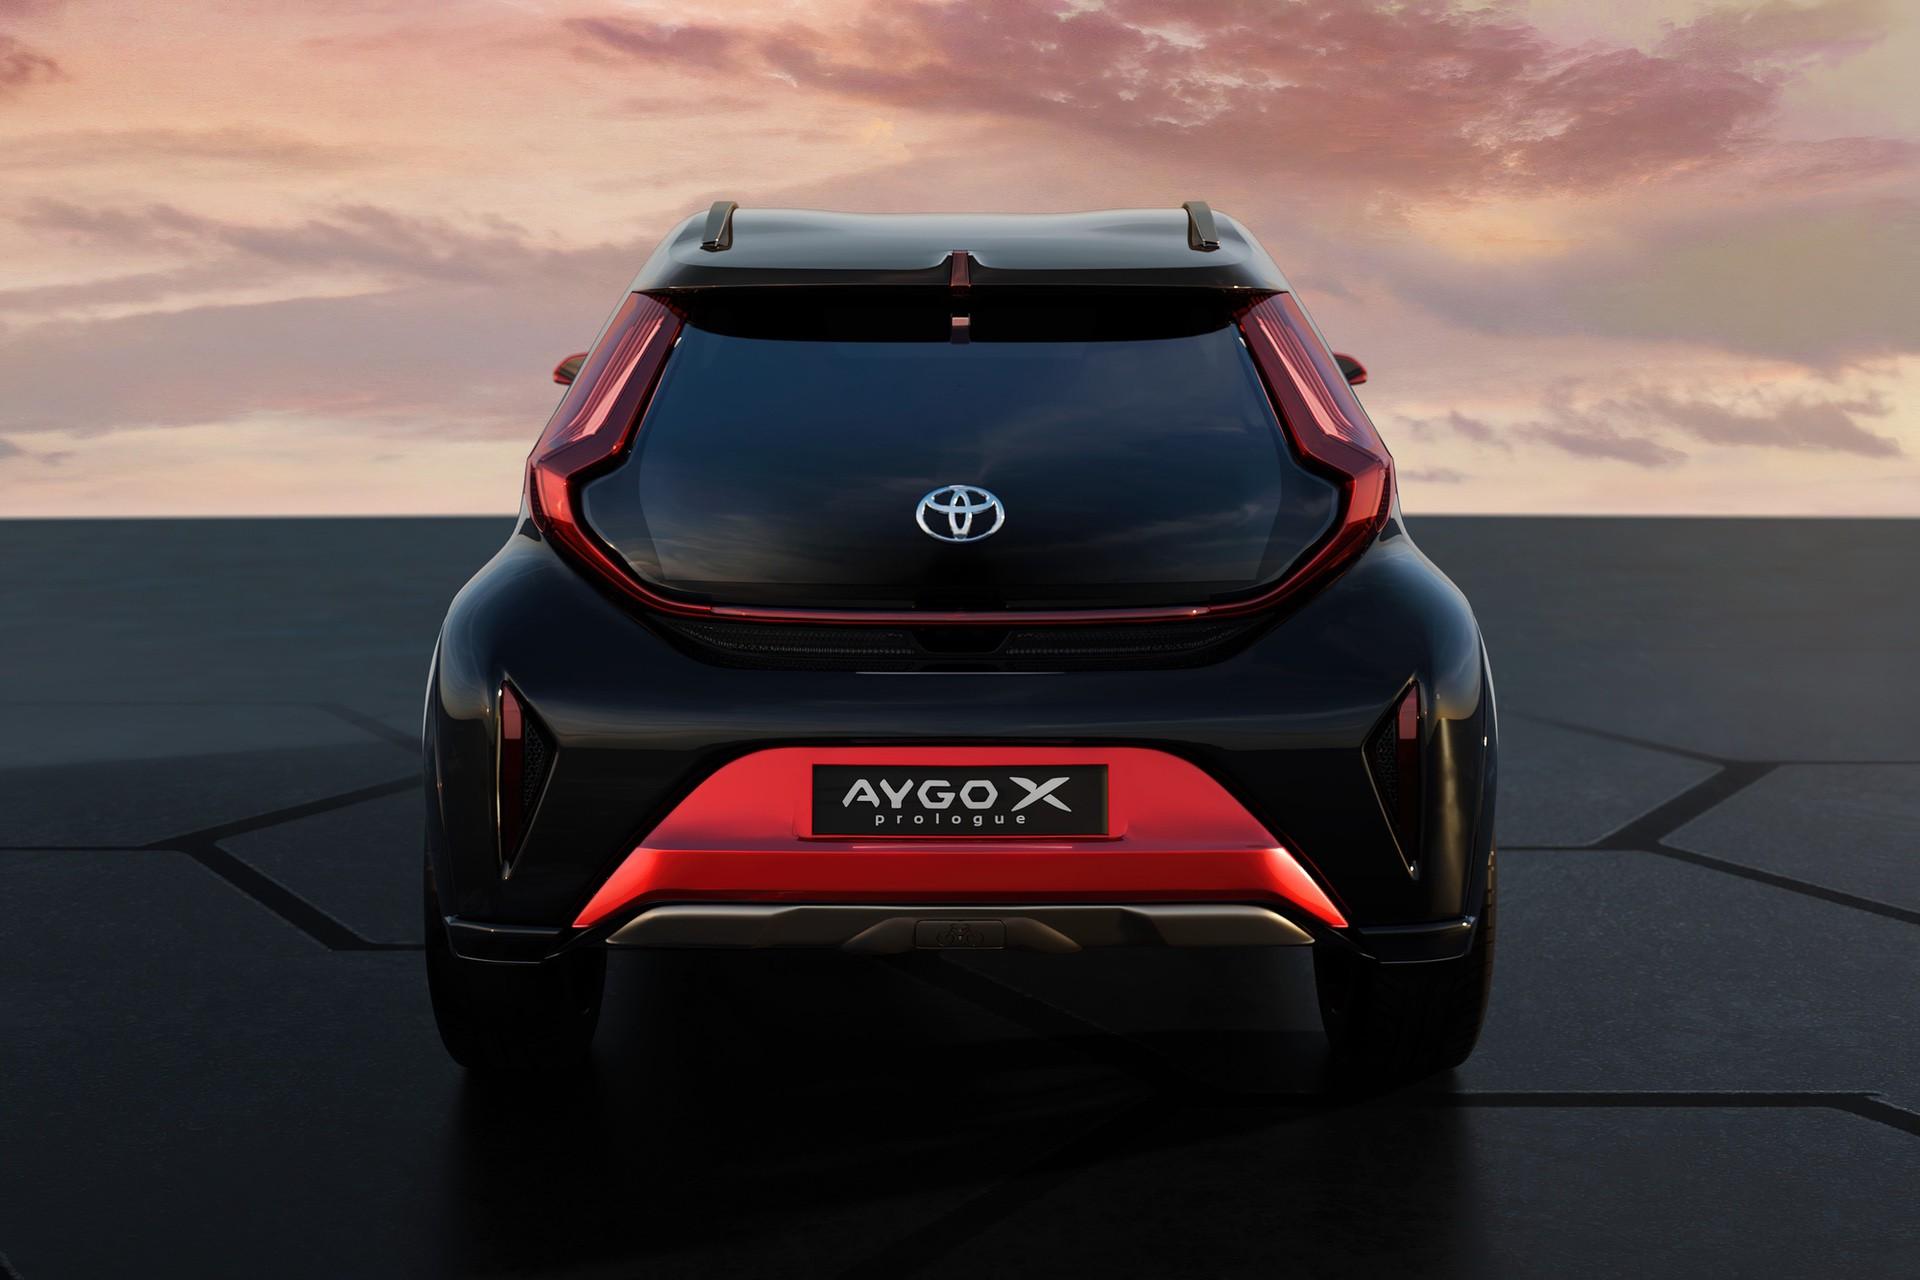 Toyota_Aygo_X_prologue-0022